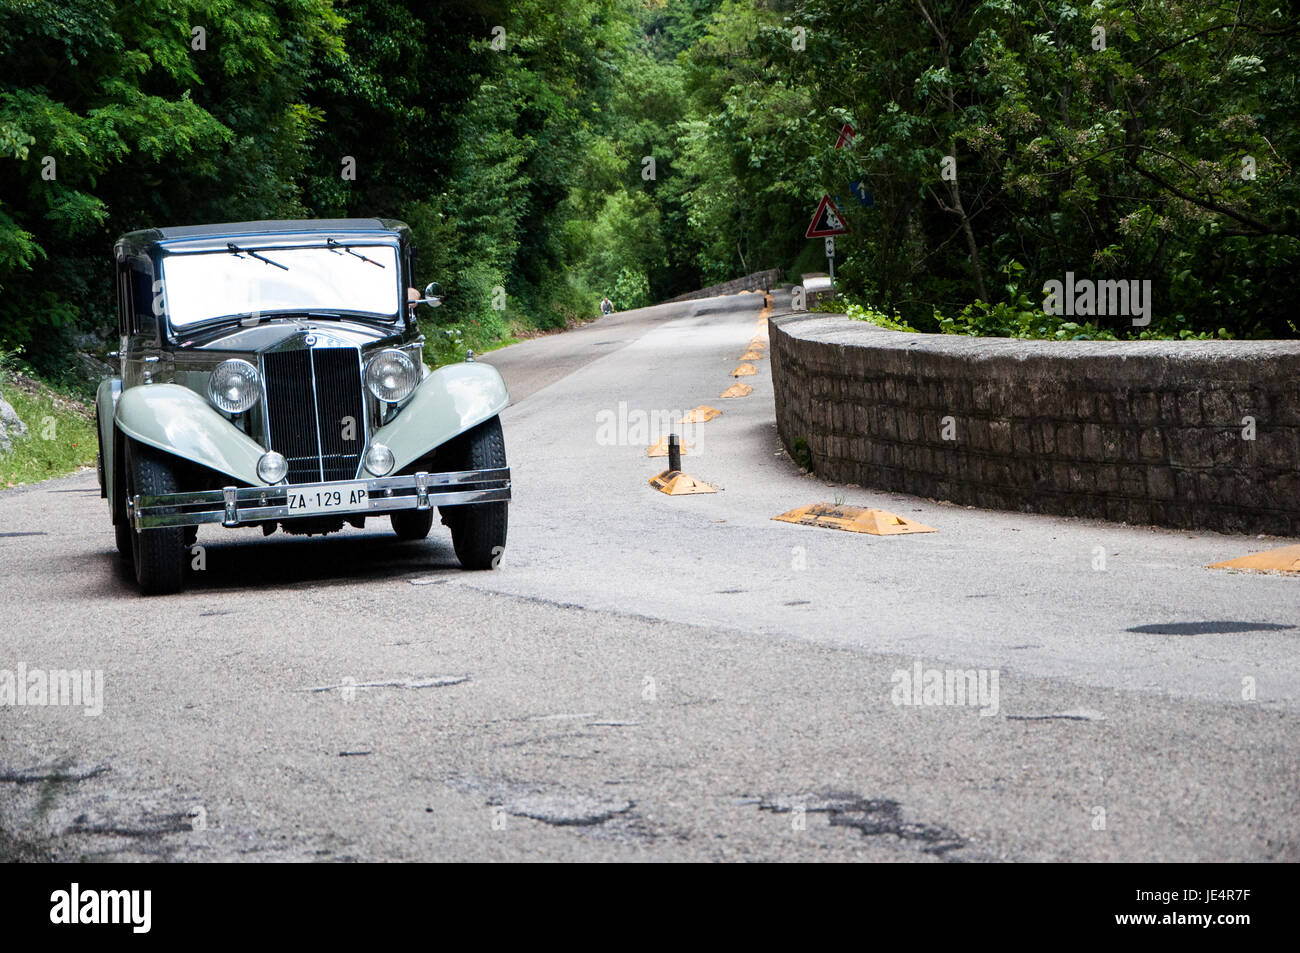 https://c8.alamy.com/comp/JE4R7F/gola-del-furlo-italy-may-19-lancia-aprilia-cabriolet-1940-on-an-old-JE4R7F.jpg